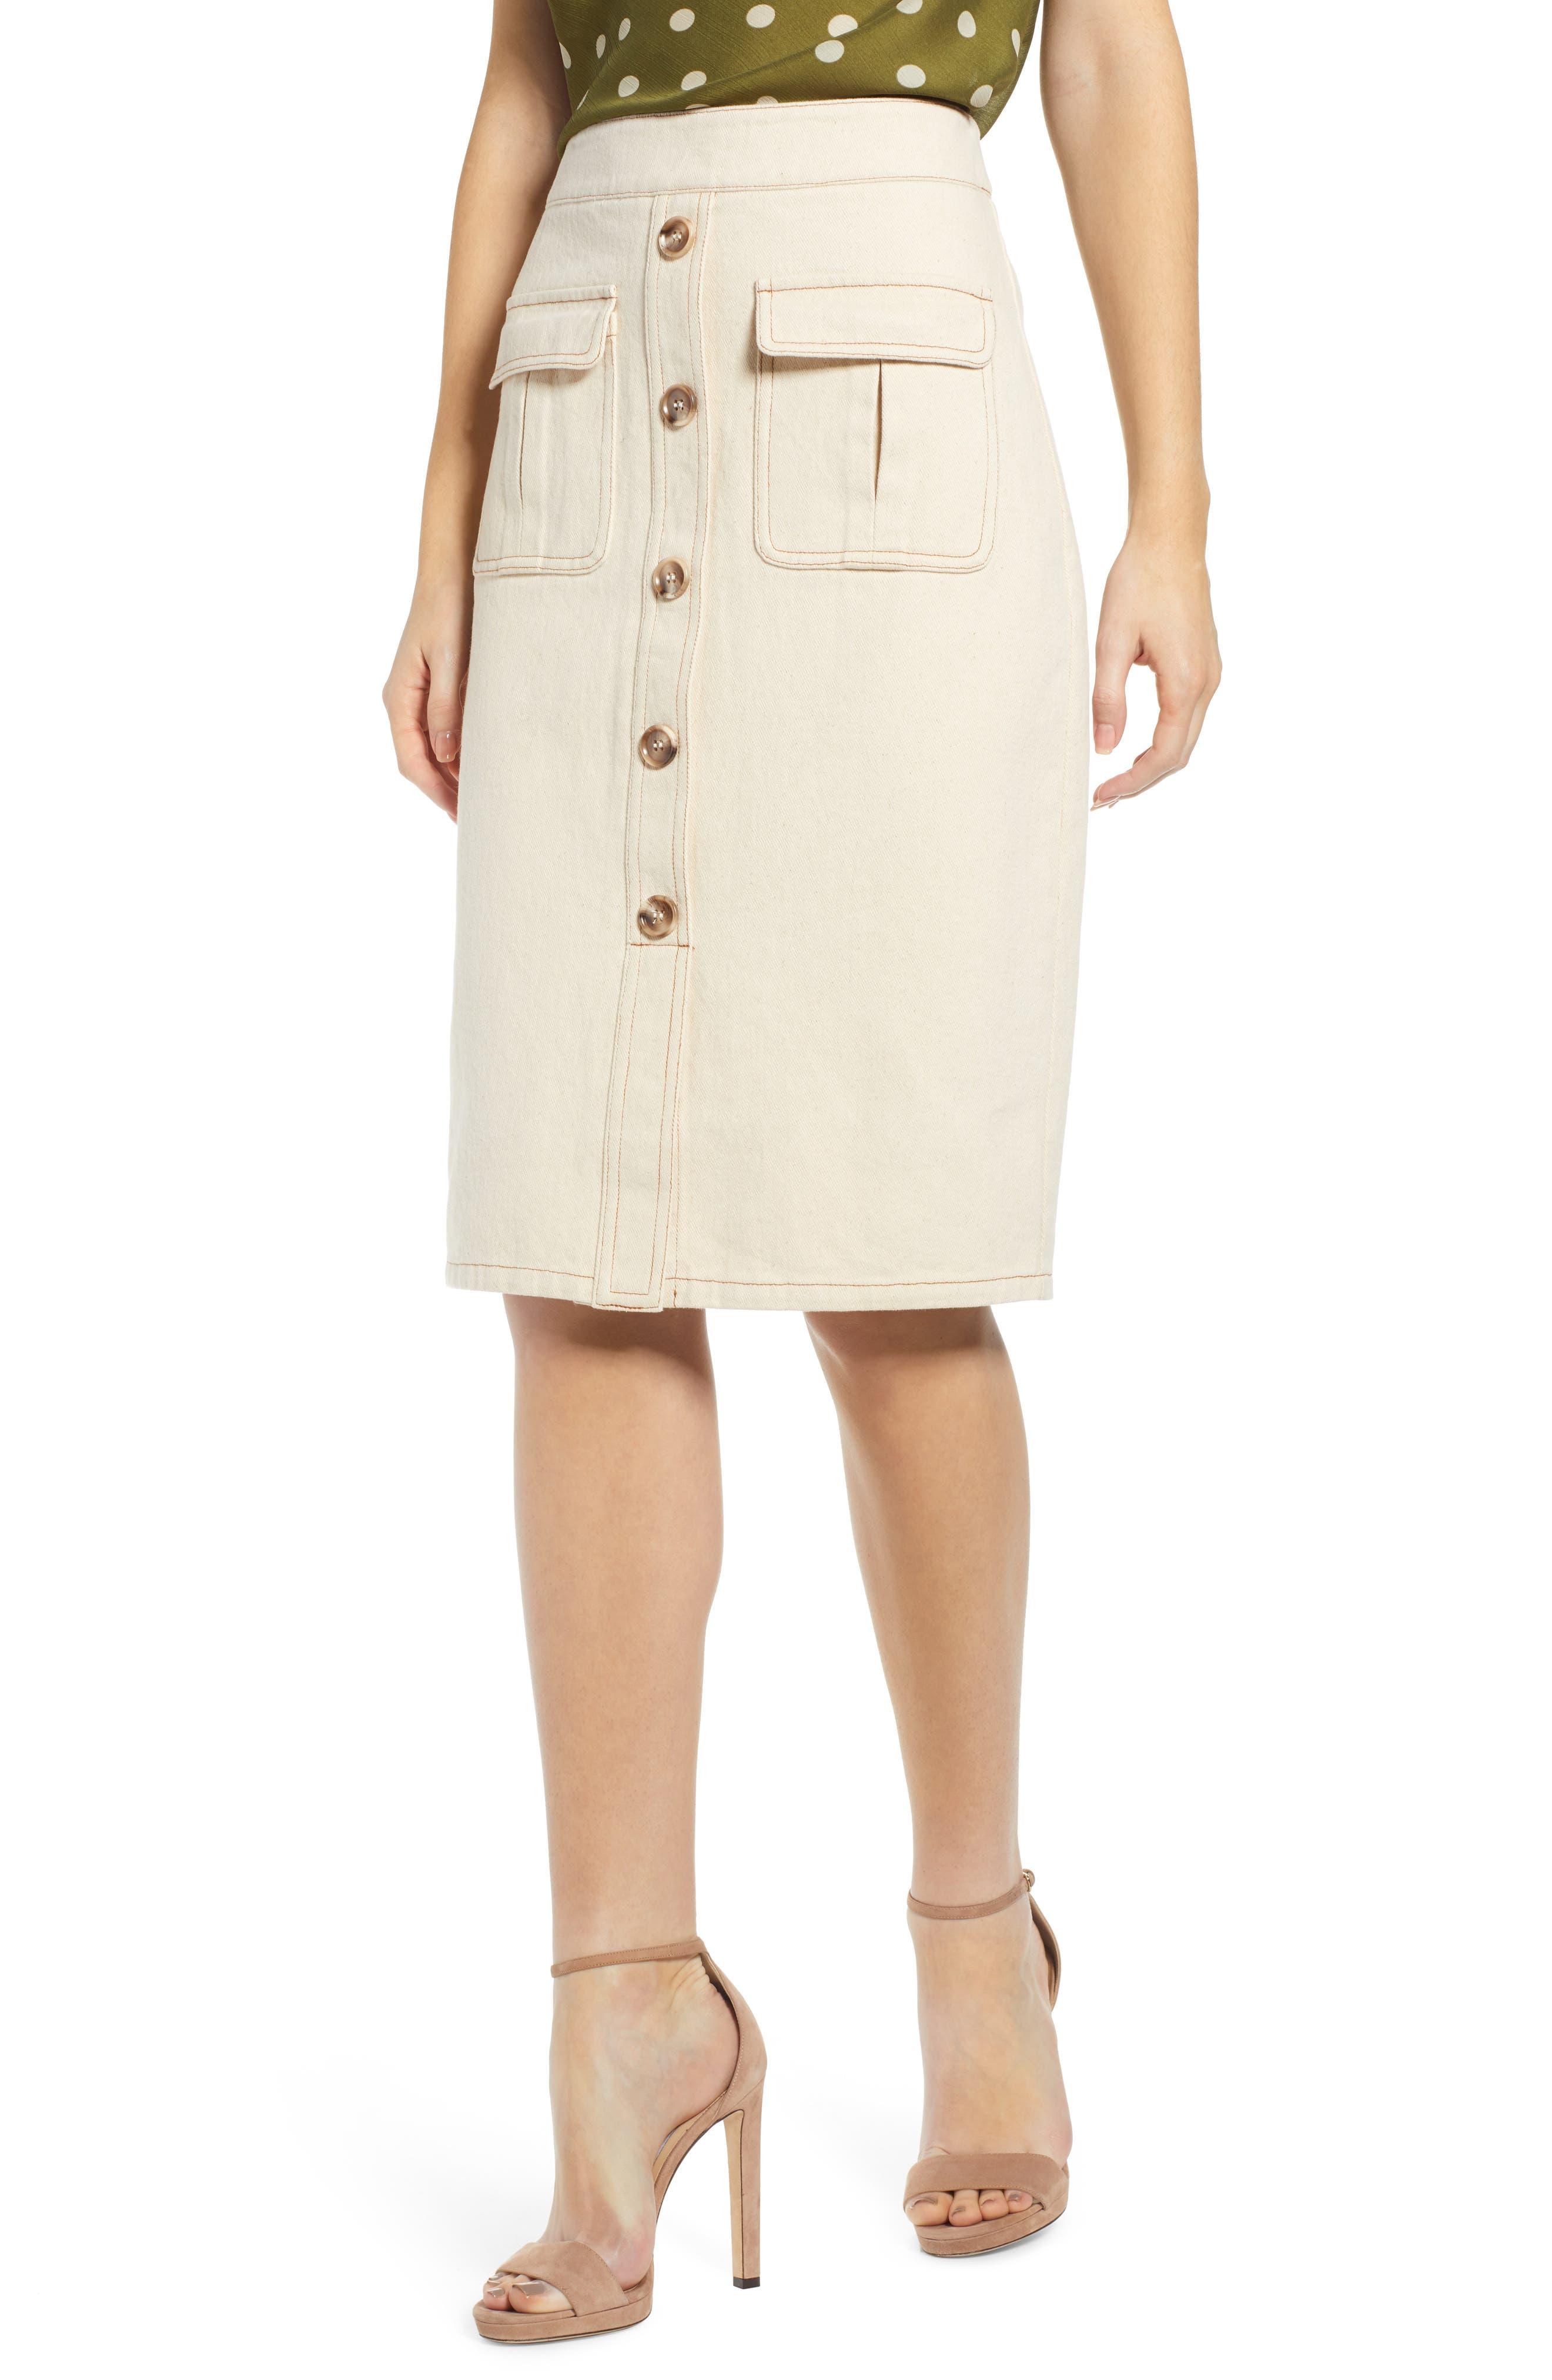 CHRISELLE LIM COLLECTION, Chriselle Lim Marine Midi Skirt, Main thumbnail 1, color, BONE